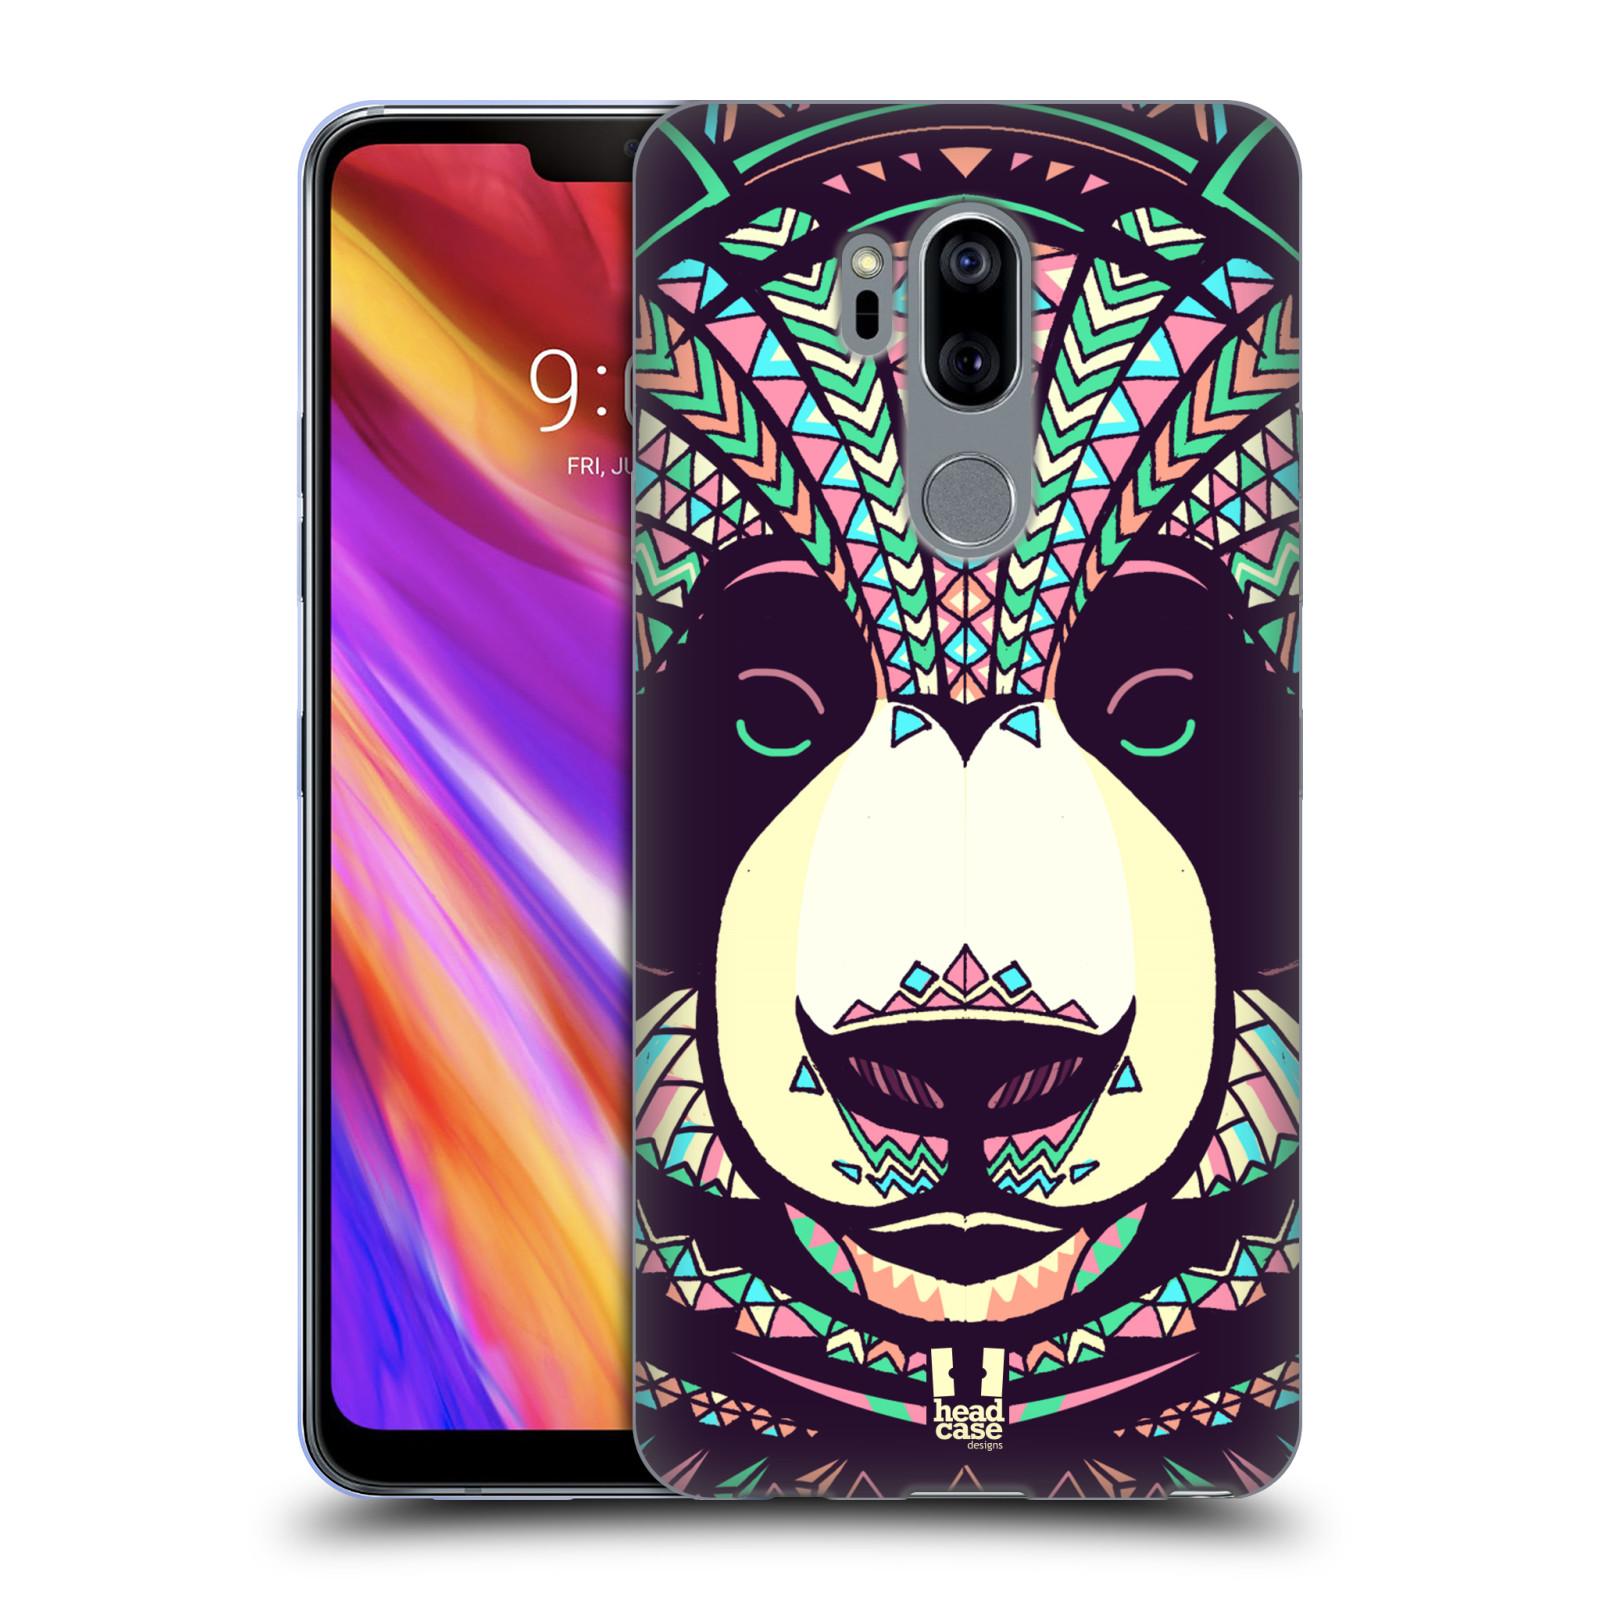 Silikonové pouzdro na mobil LG G7 ThinQ - Head Case - AZTEC PANDA